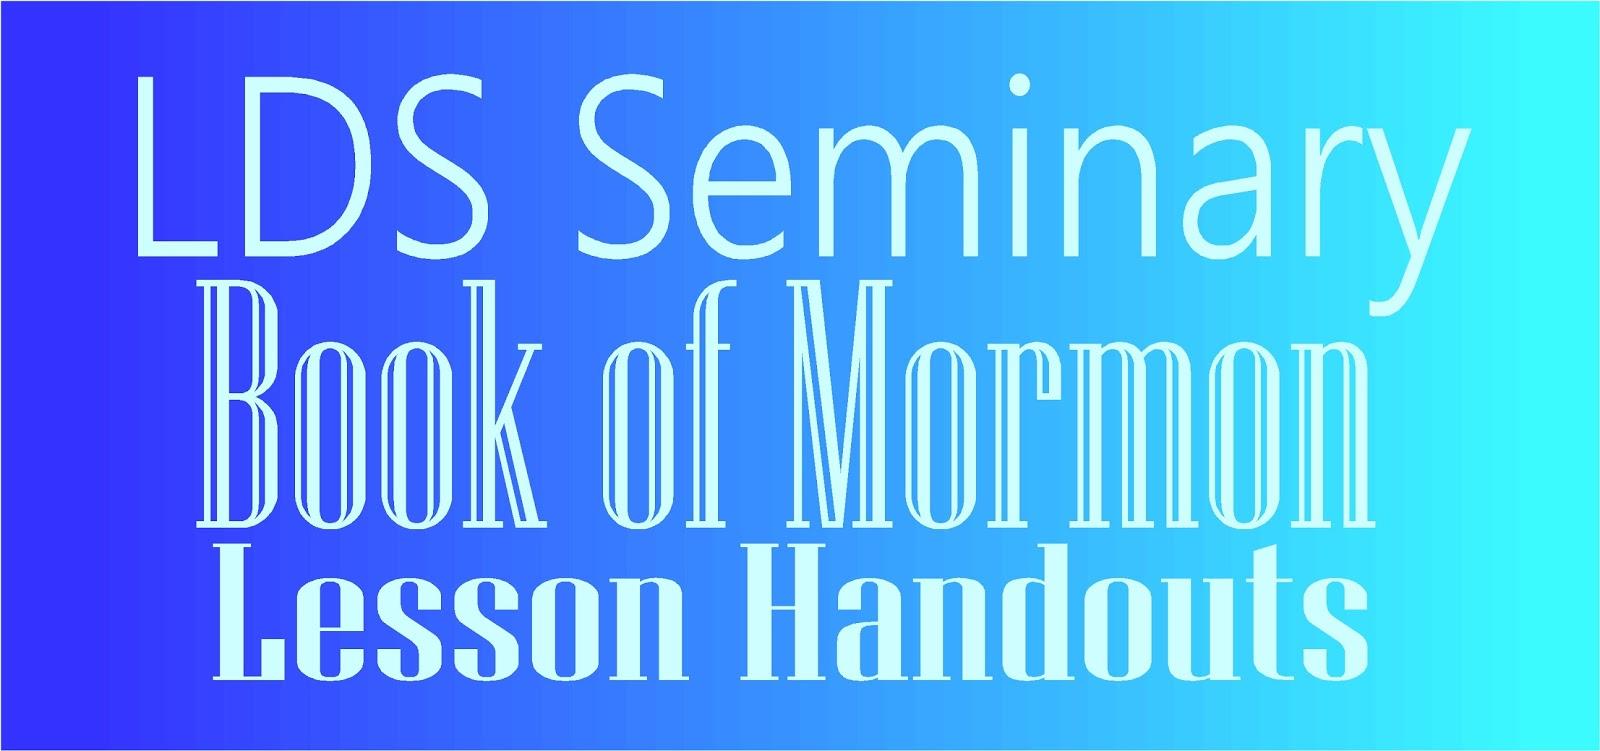 Book Of Mormon Quotes Hollyshome  Church Fun Lds Seminary Book Of Mormon Lesson Handouts